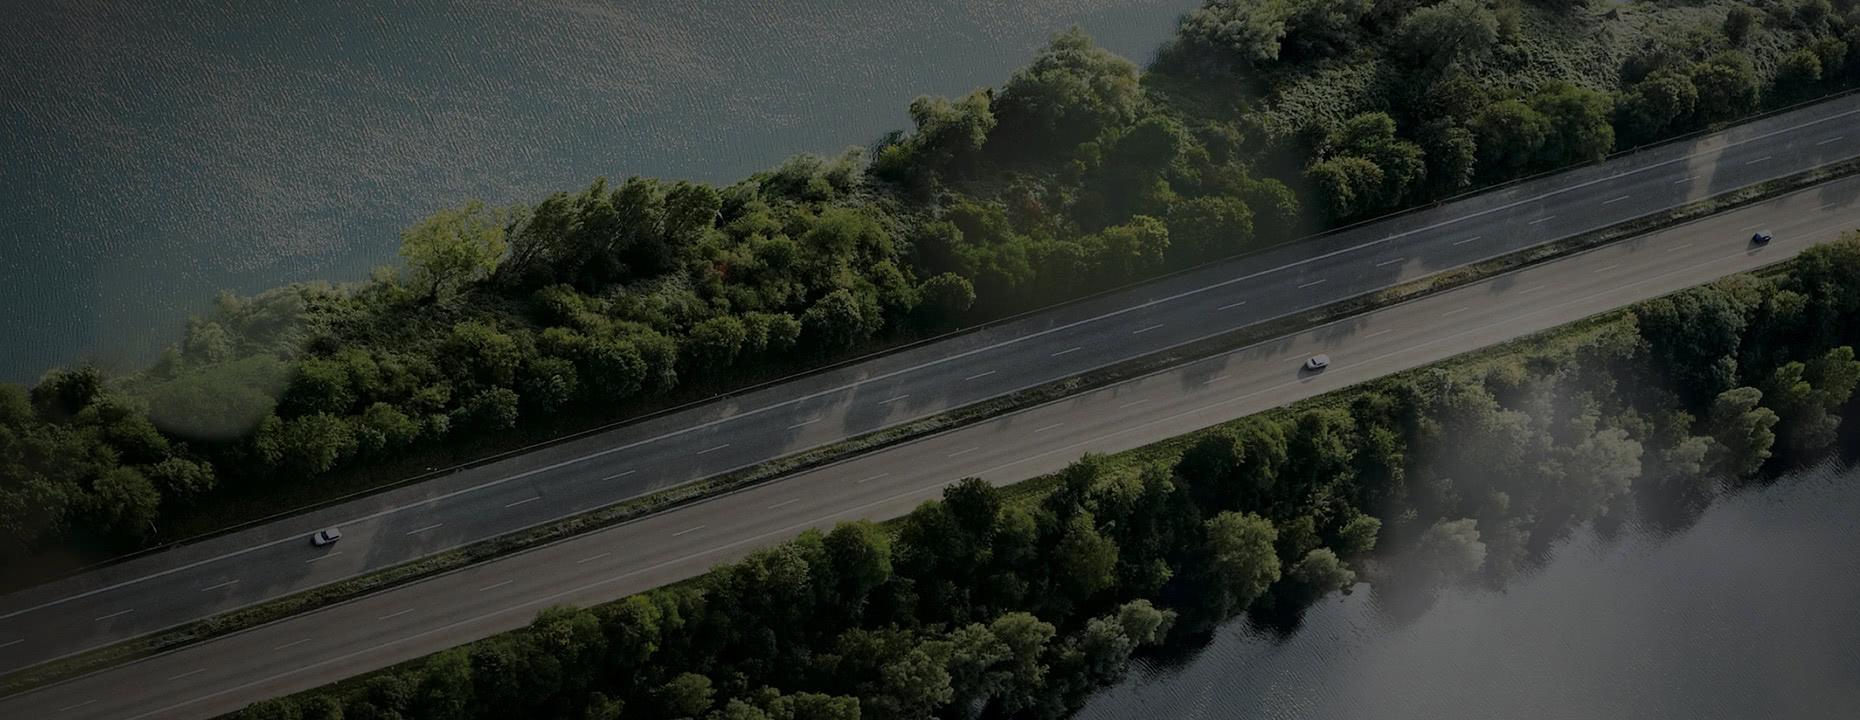 Hyundai Palisade та концепт Le Fil Rouge здобули премії iF Design Awards-2019 | Хюндай Мотор Поділля - фото 8